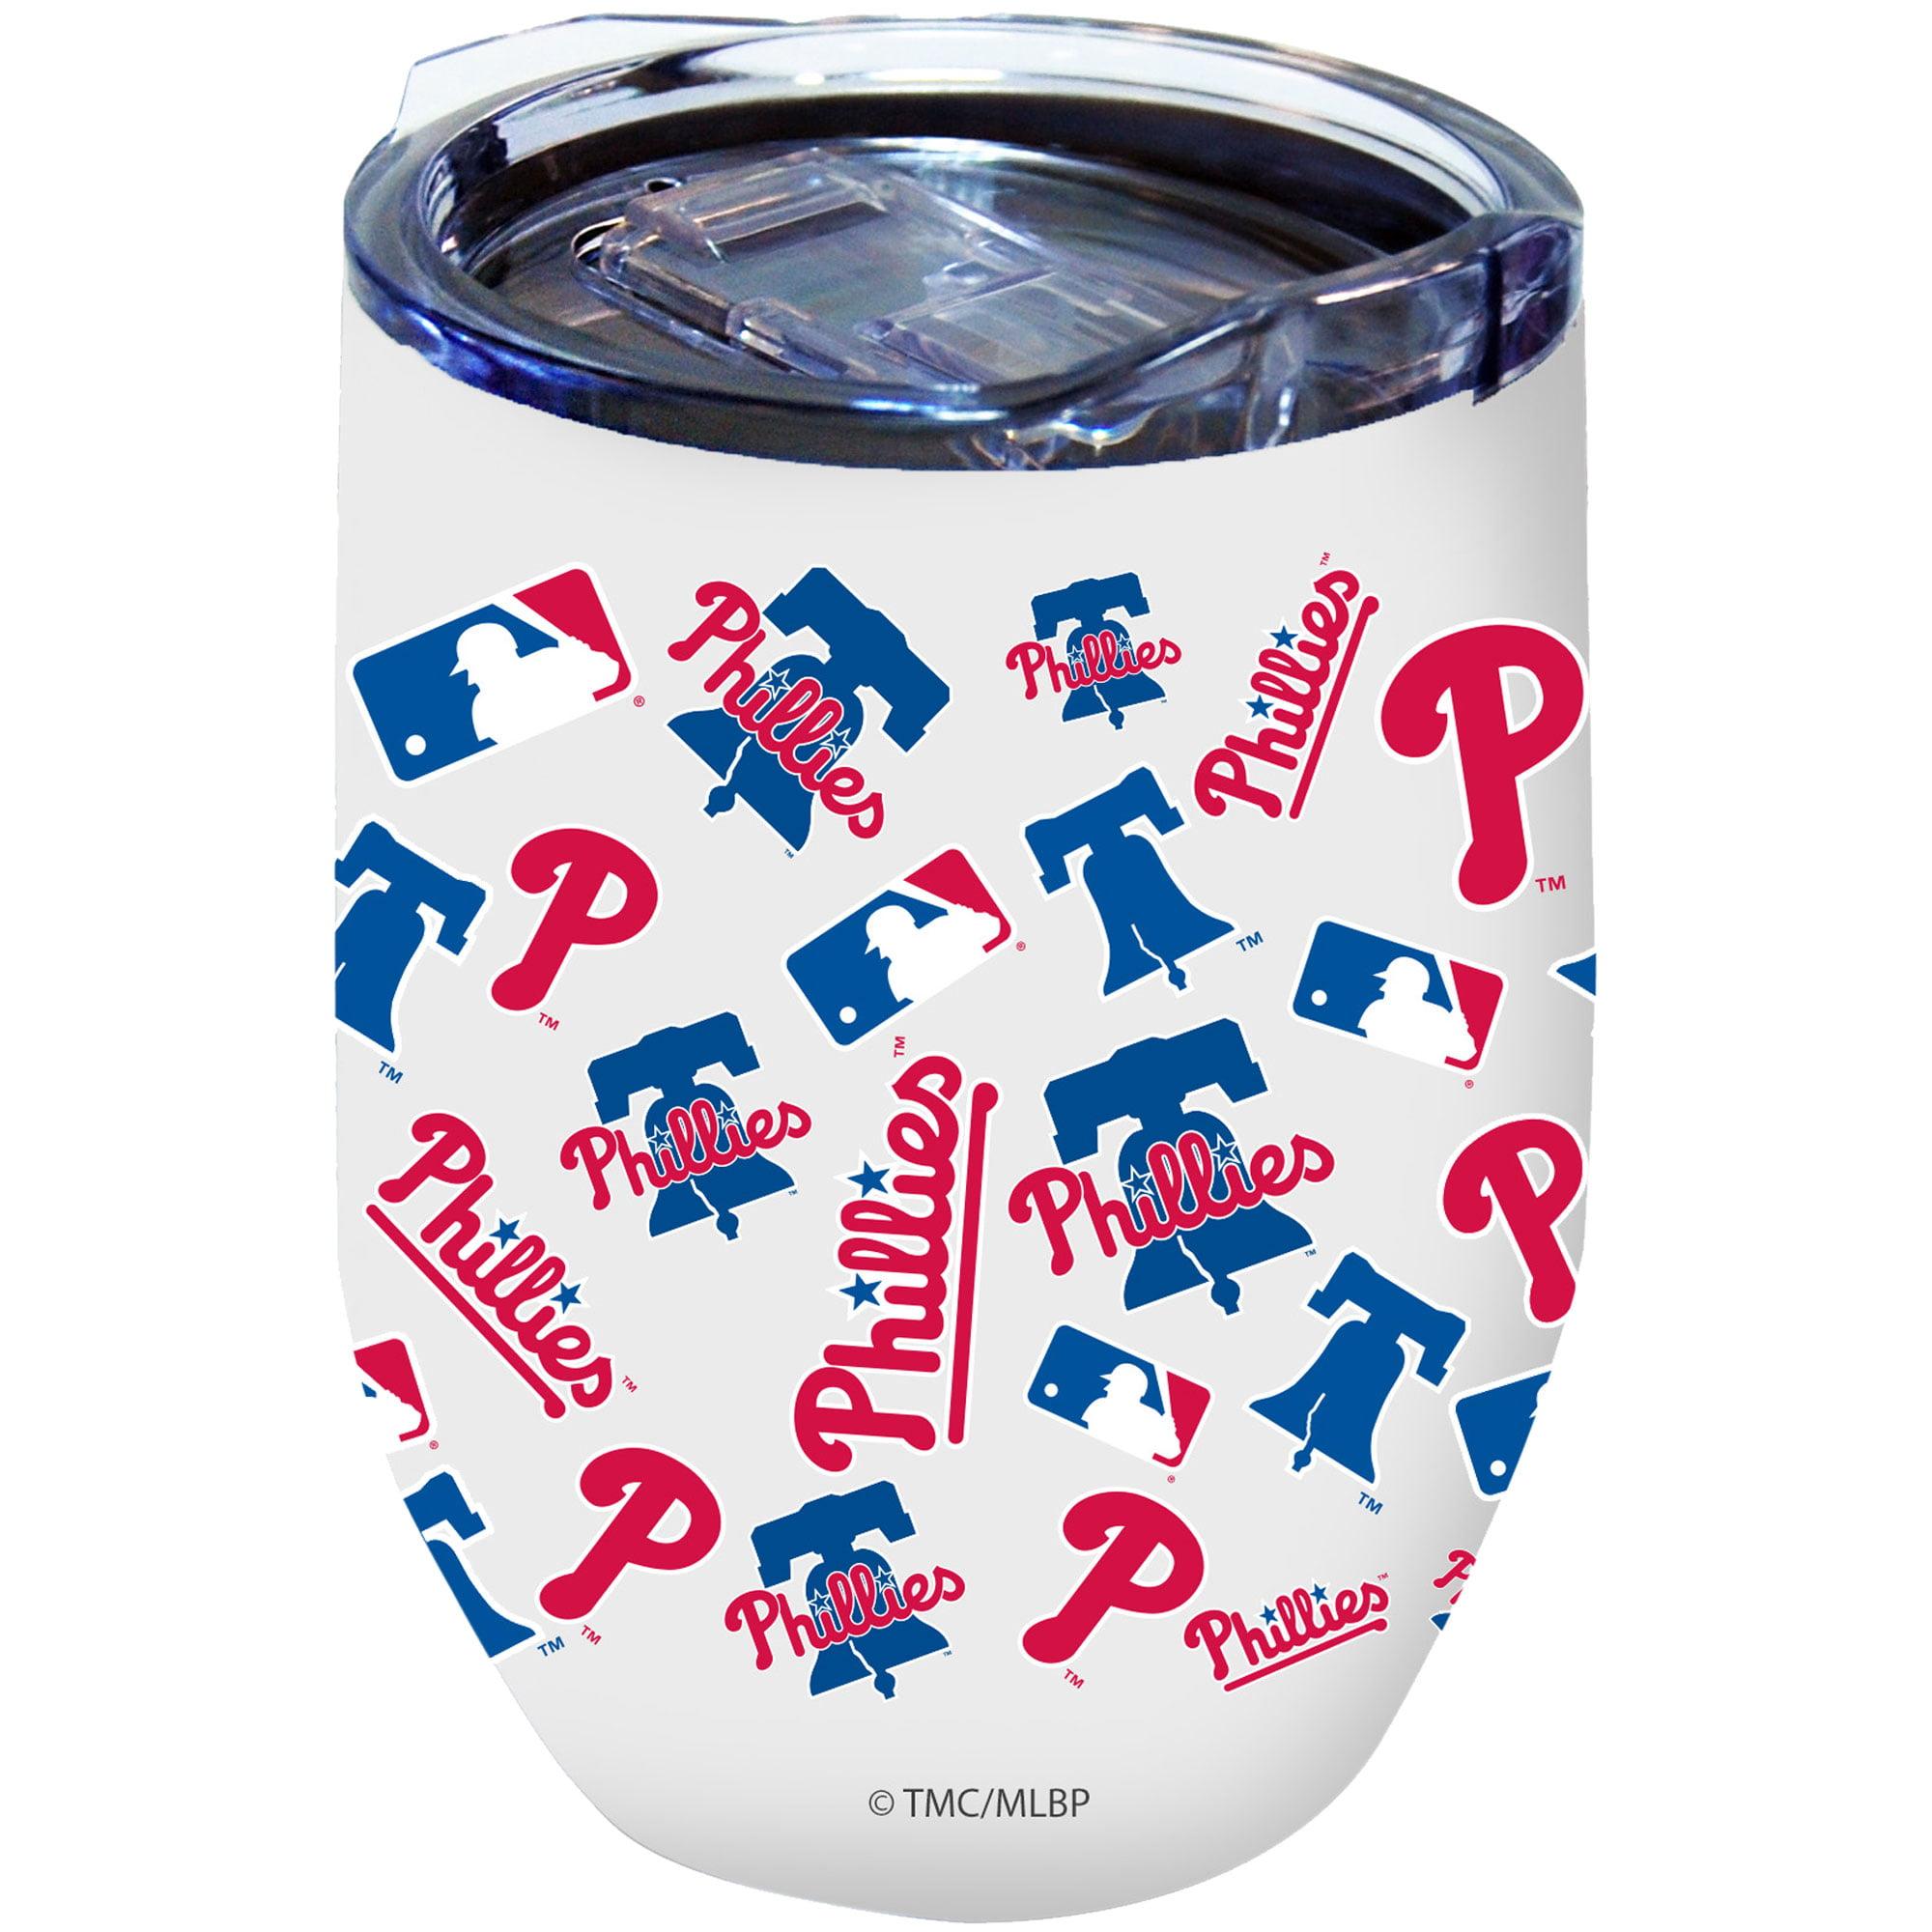 Philadelphia Phillies 16oz. Powder-Coated Full Wrap Stemless Tumbler Cup - No Size